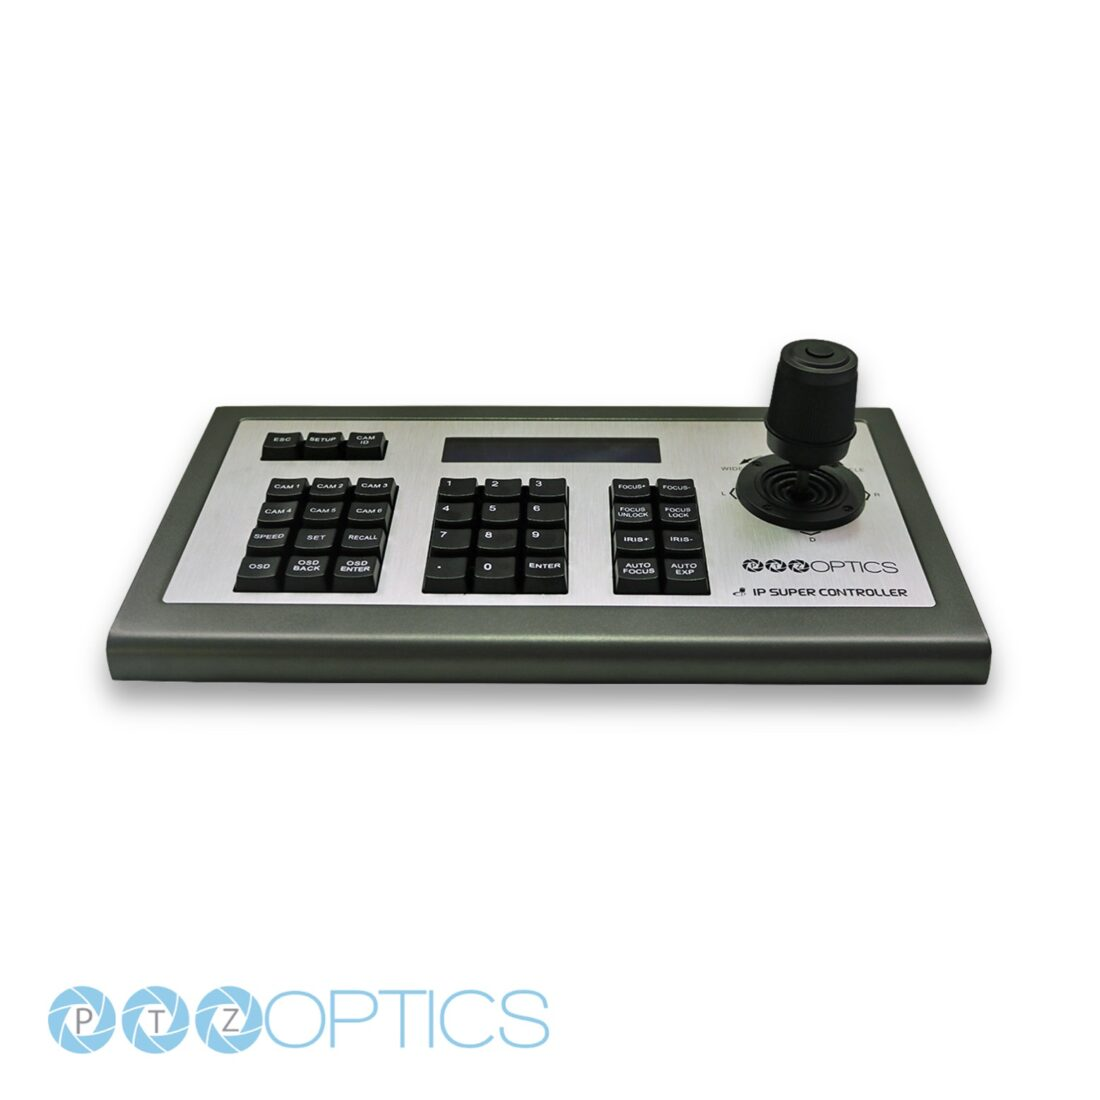 PTZOptics PT-JOY-G3 controller